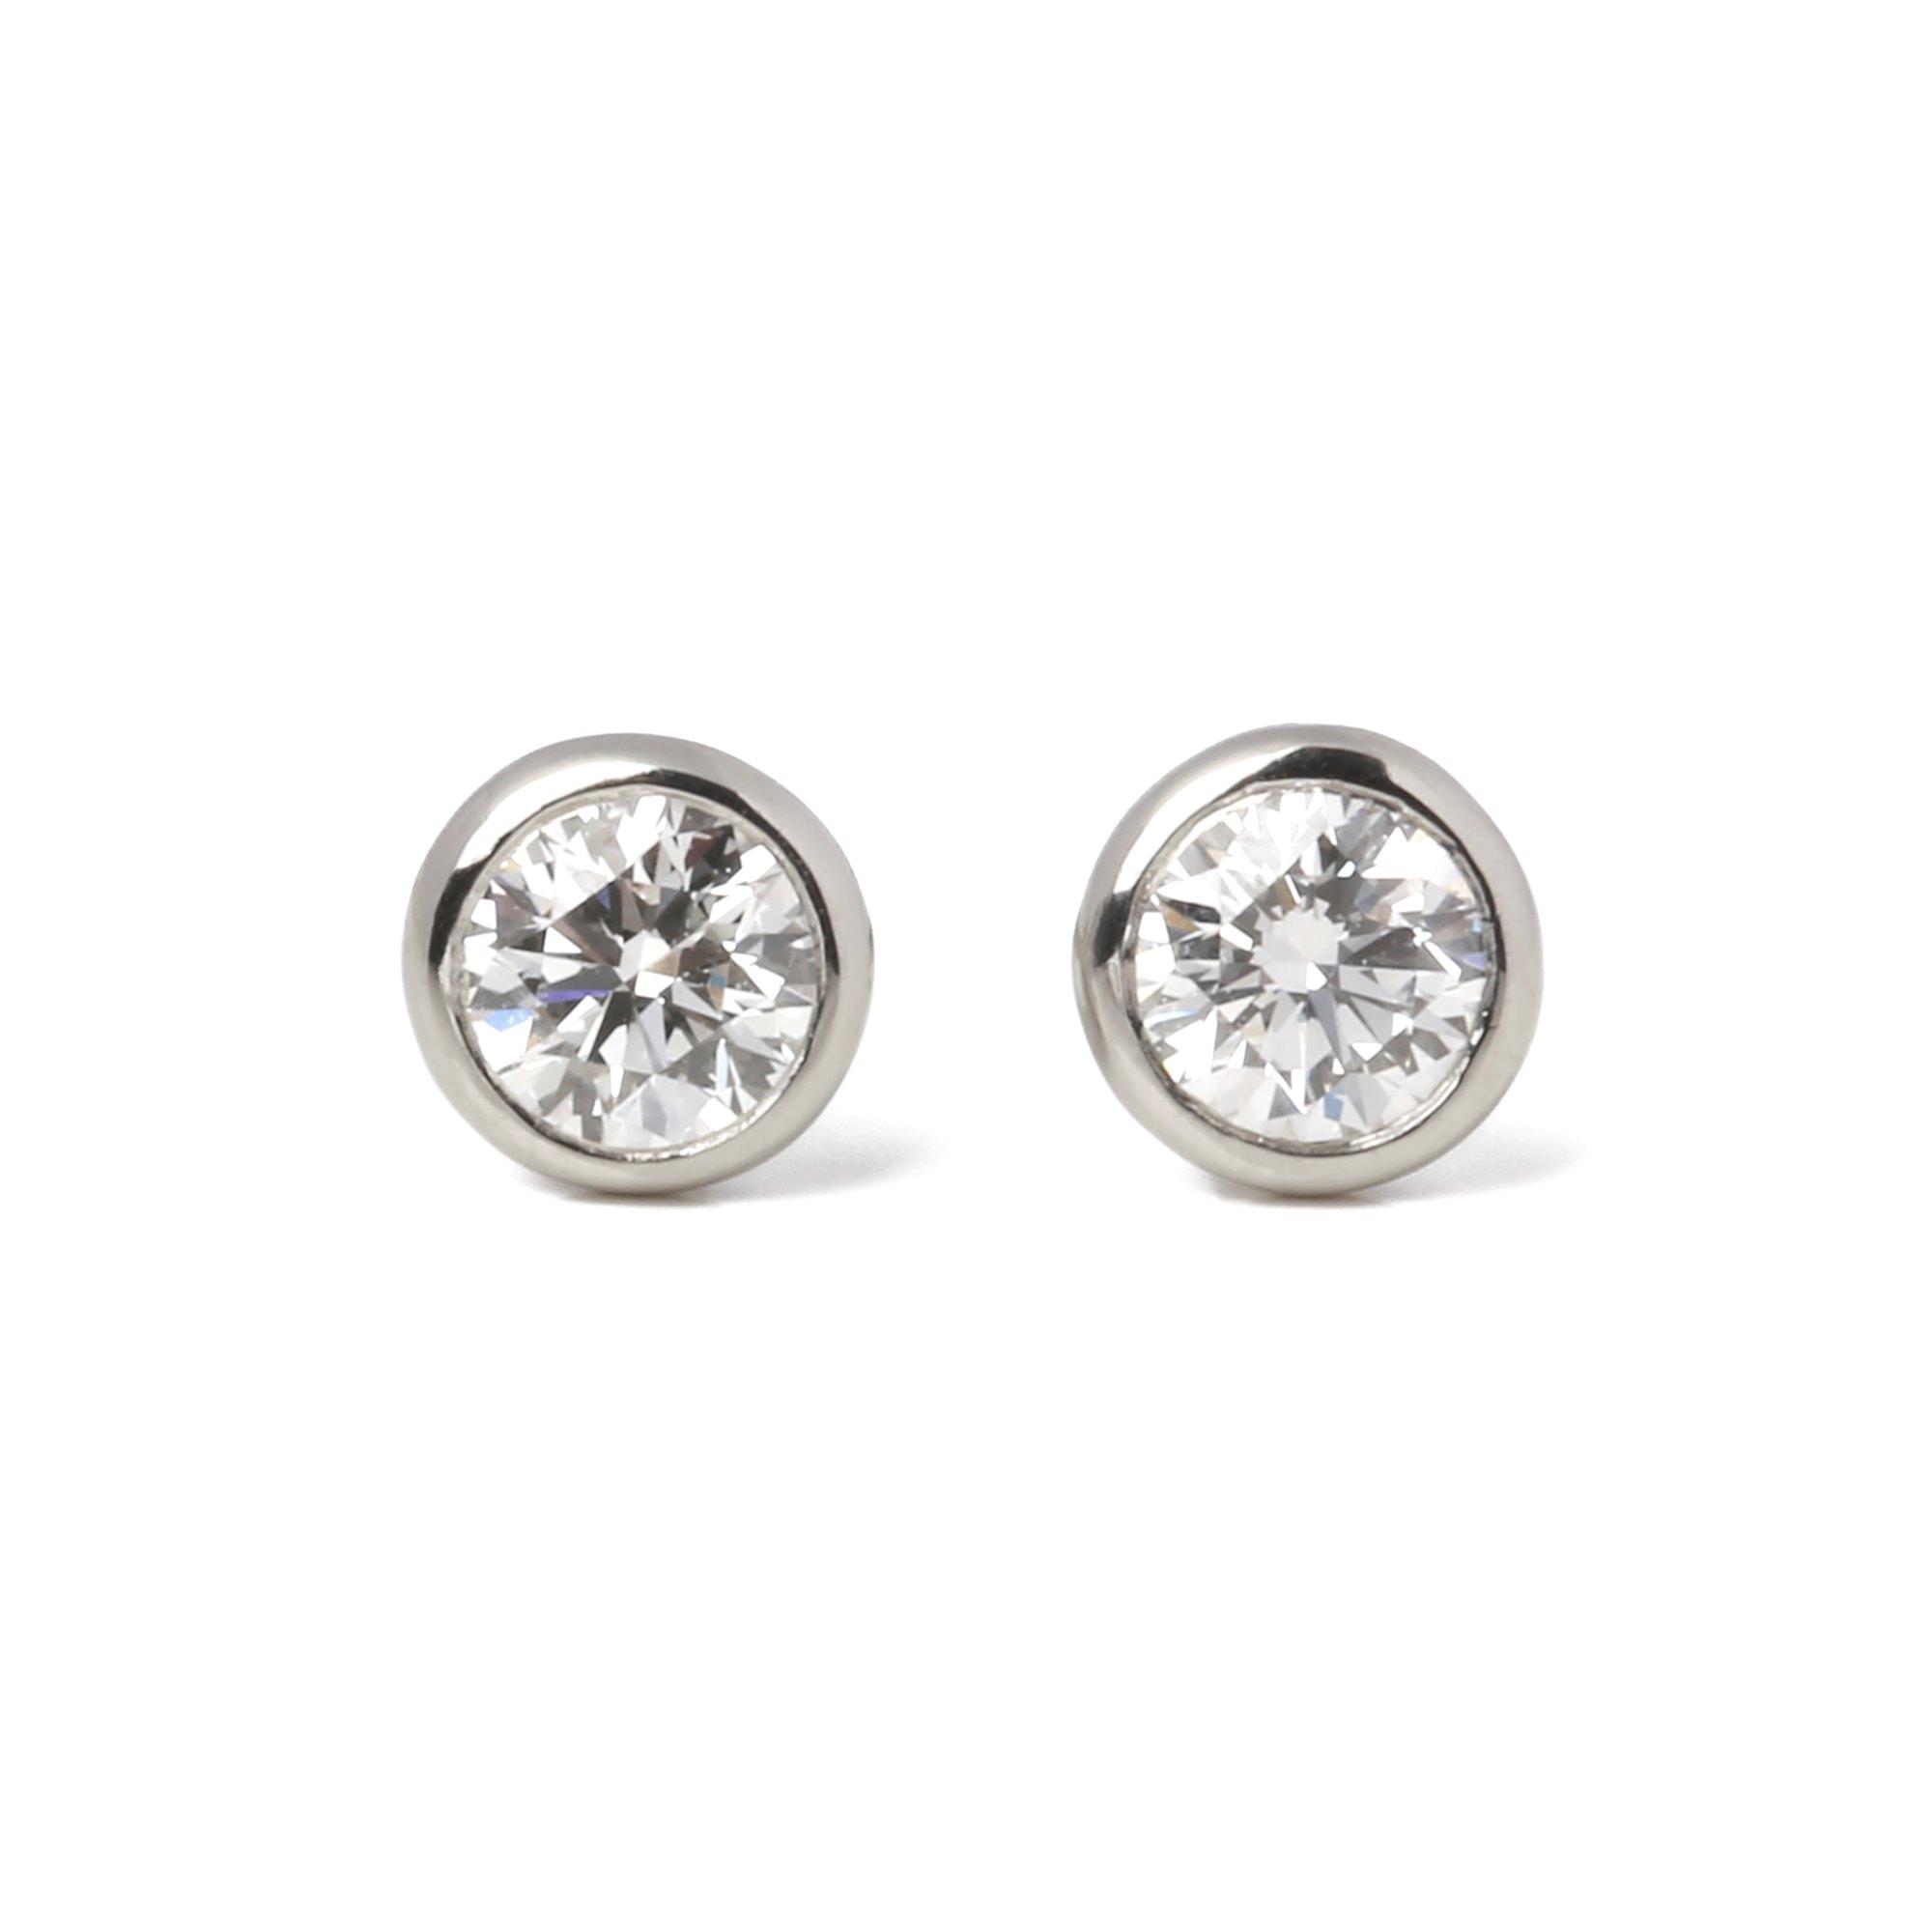 Tiffany & Co. Diamonds by the Yard 0.34ct stud earrings